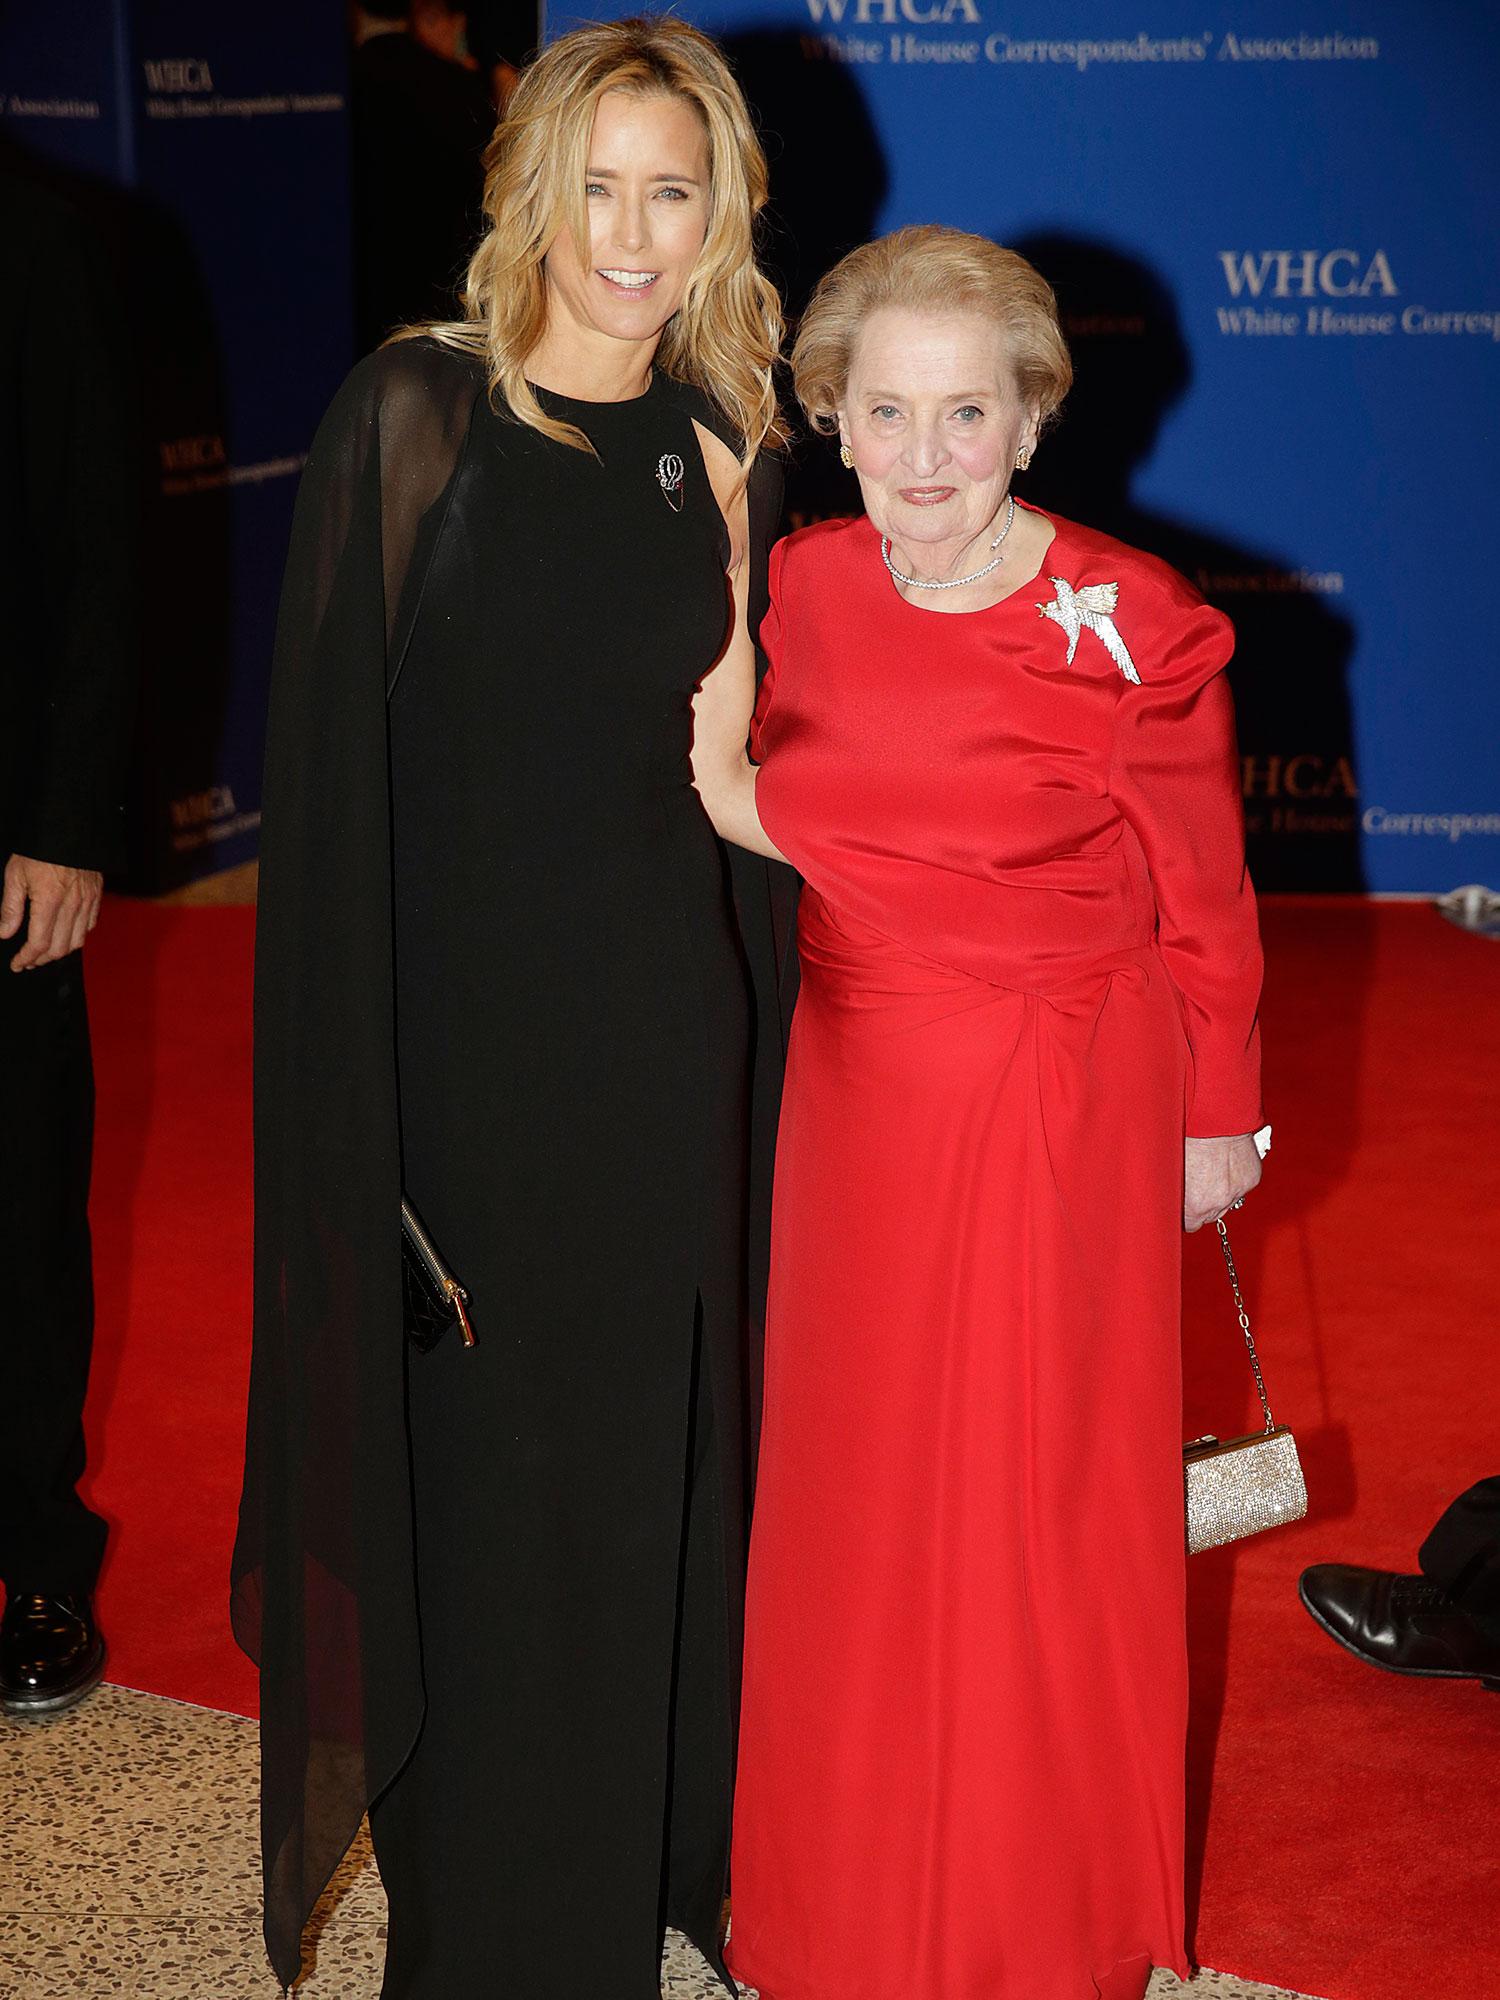 Tea Leoni and Madeleine Albright